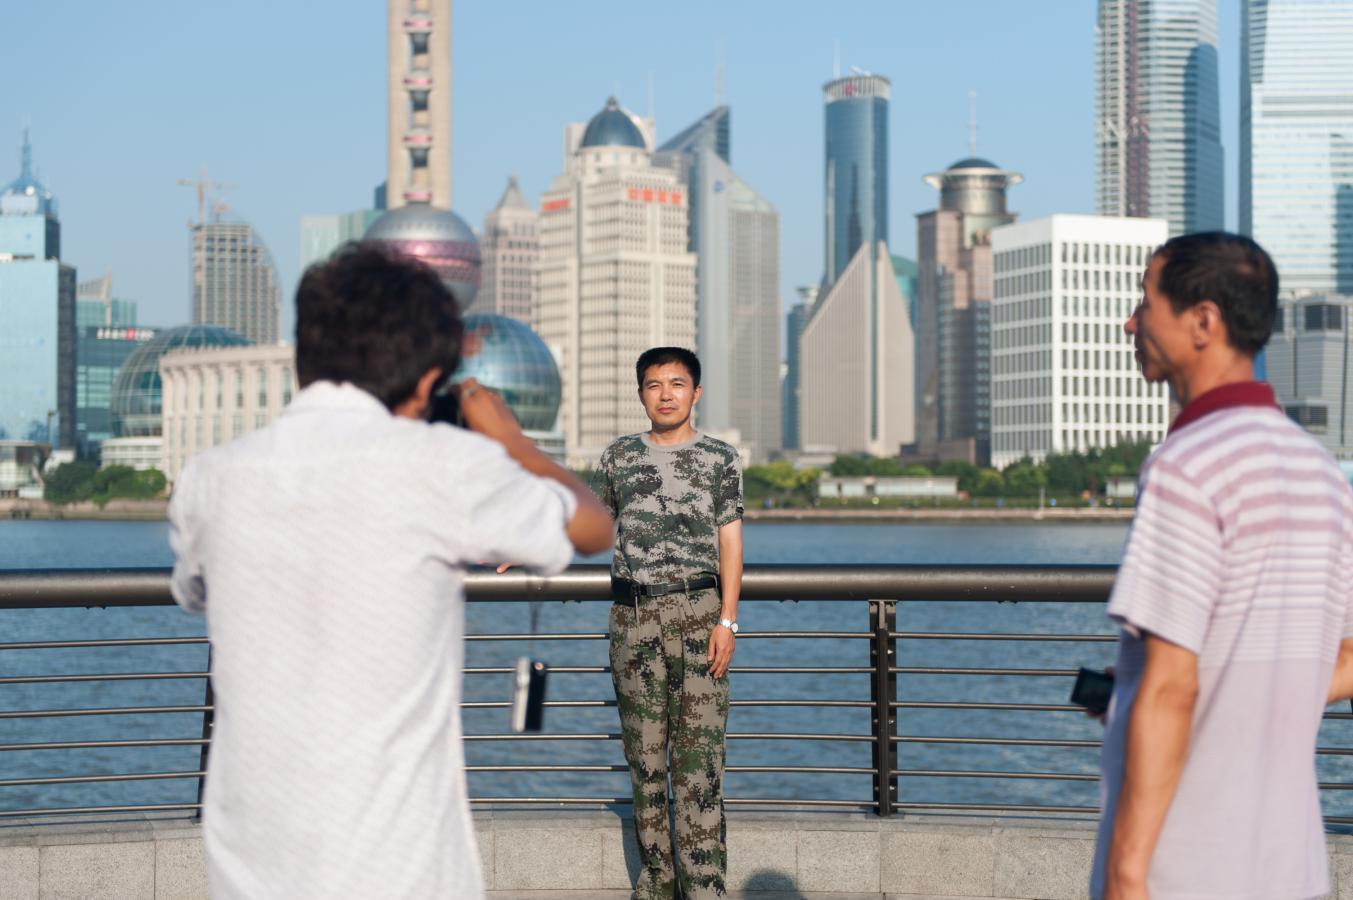 urban-camouflage-shanghai-2010